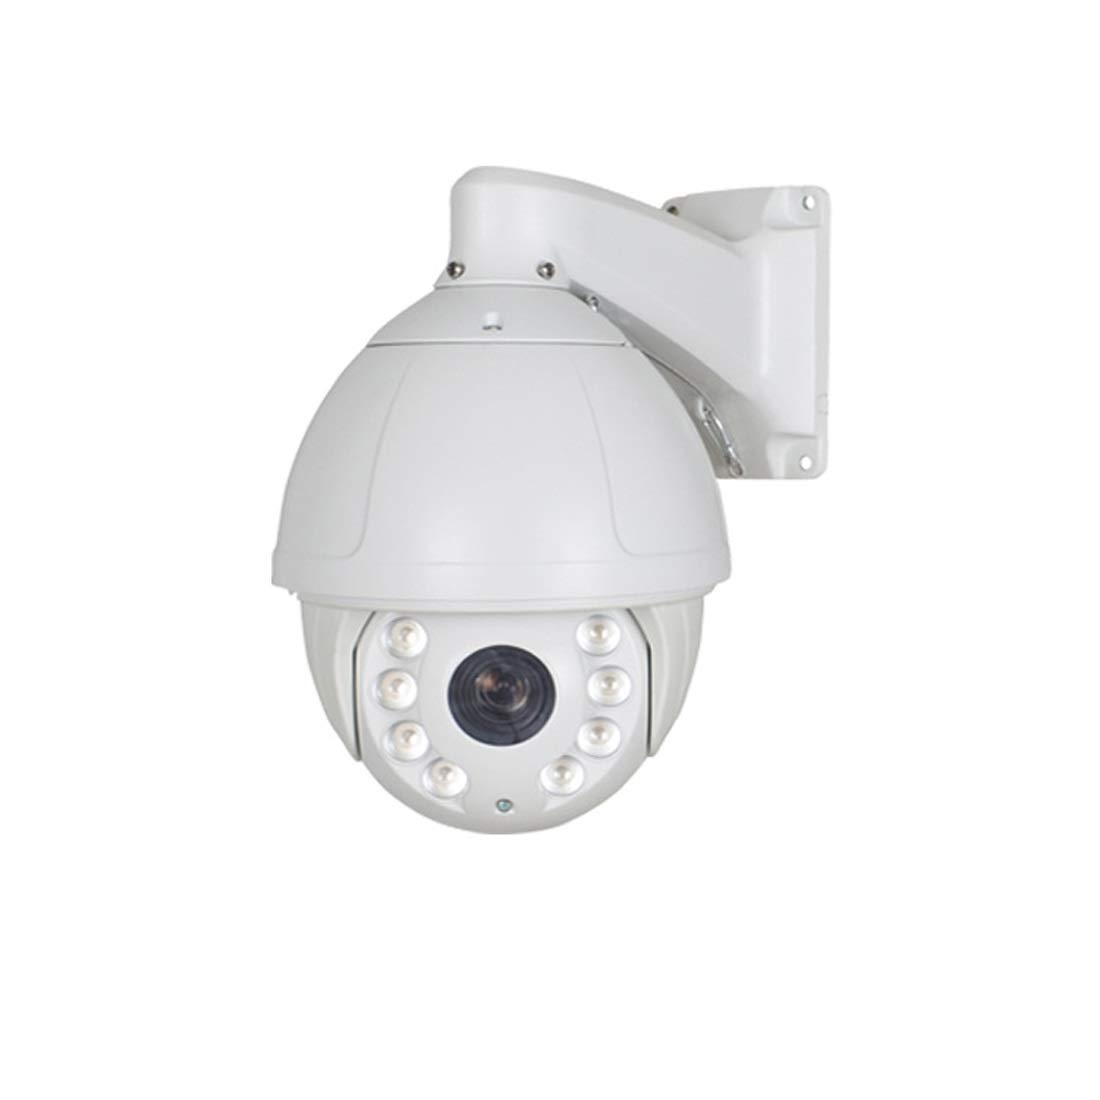 LilyAngel ホワイト HD監視カメラh (色 265屋外高速ボール防水カメラ HD監視カメラh (色 : ホワイト) ホワイト B07R3VJGSW, ムサシムラヤマシ:d482d7d0 --- m2cweb.com